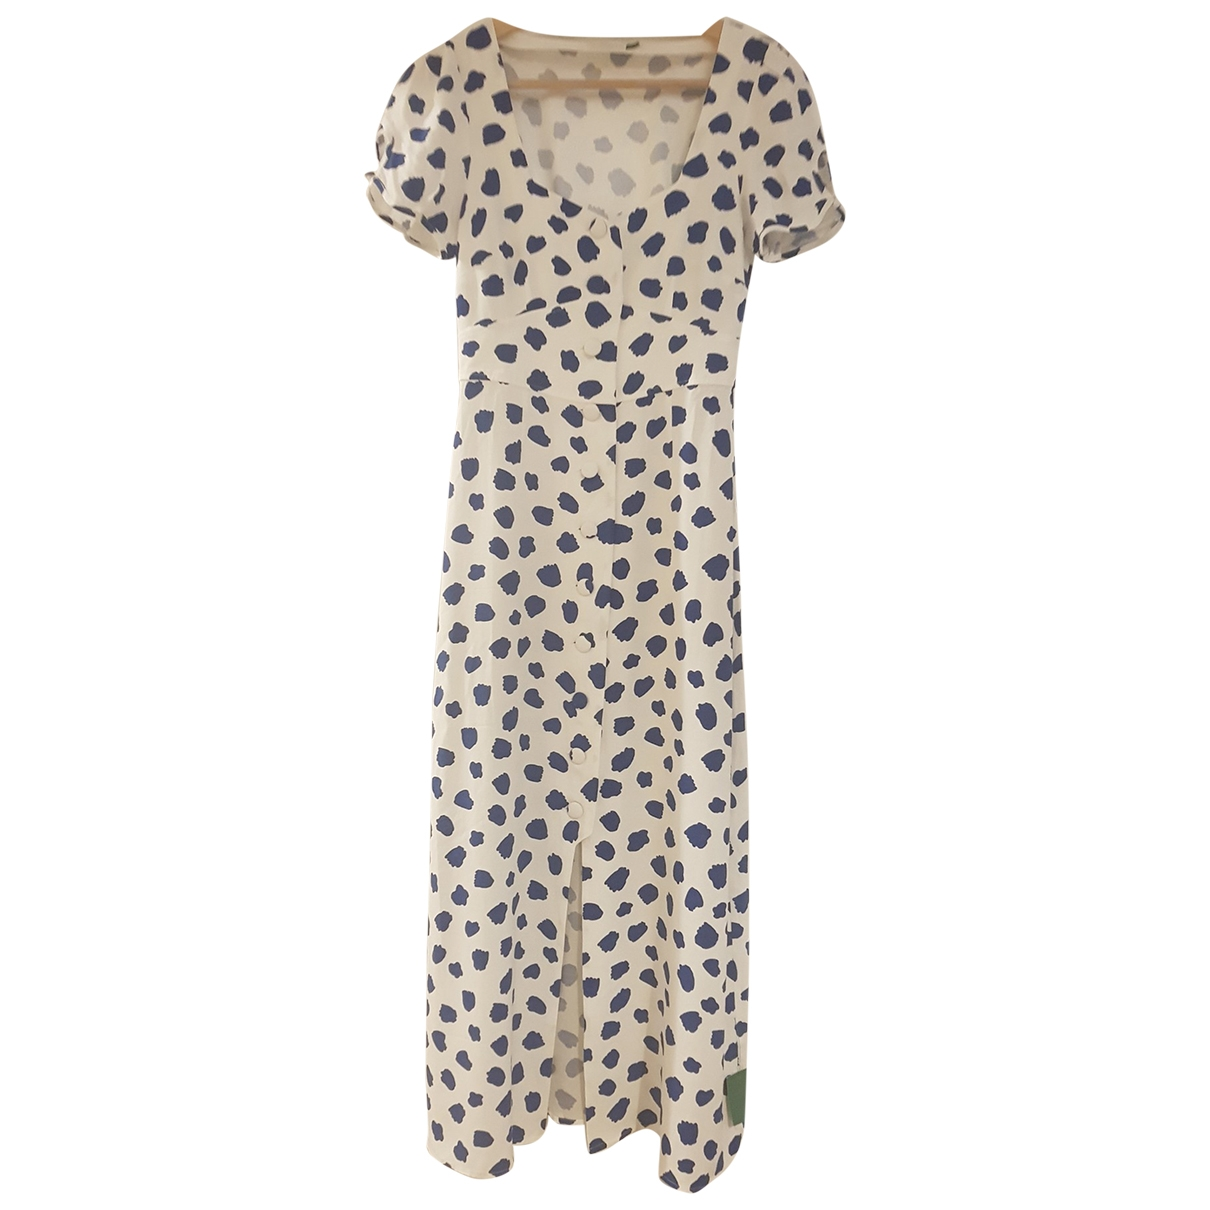 Rixo \N White dress for Women XXS International